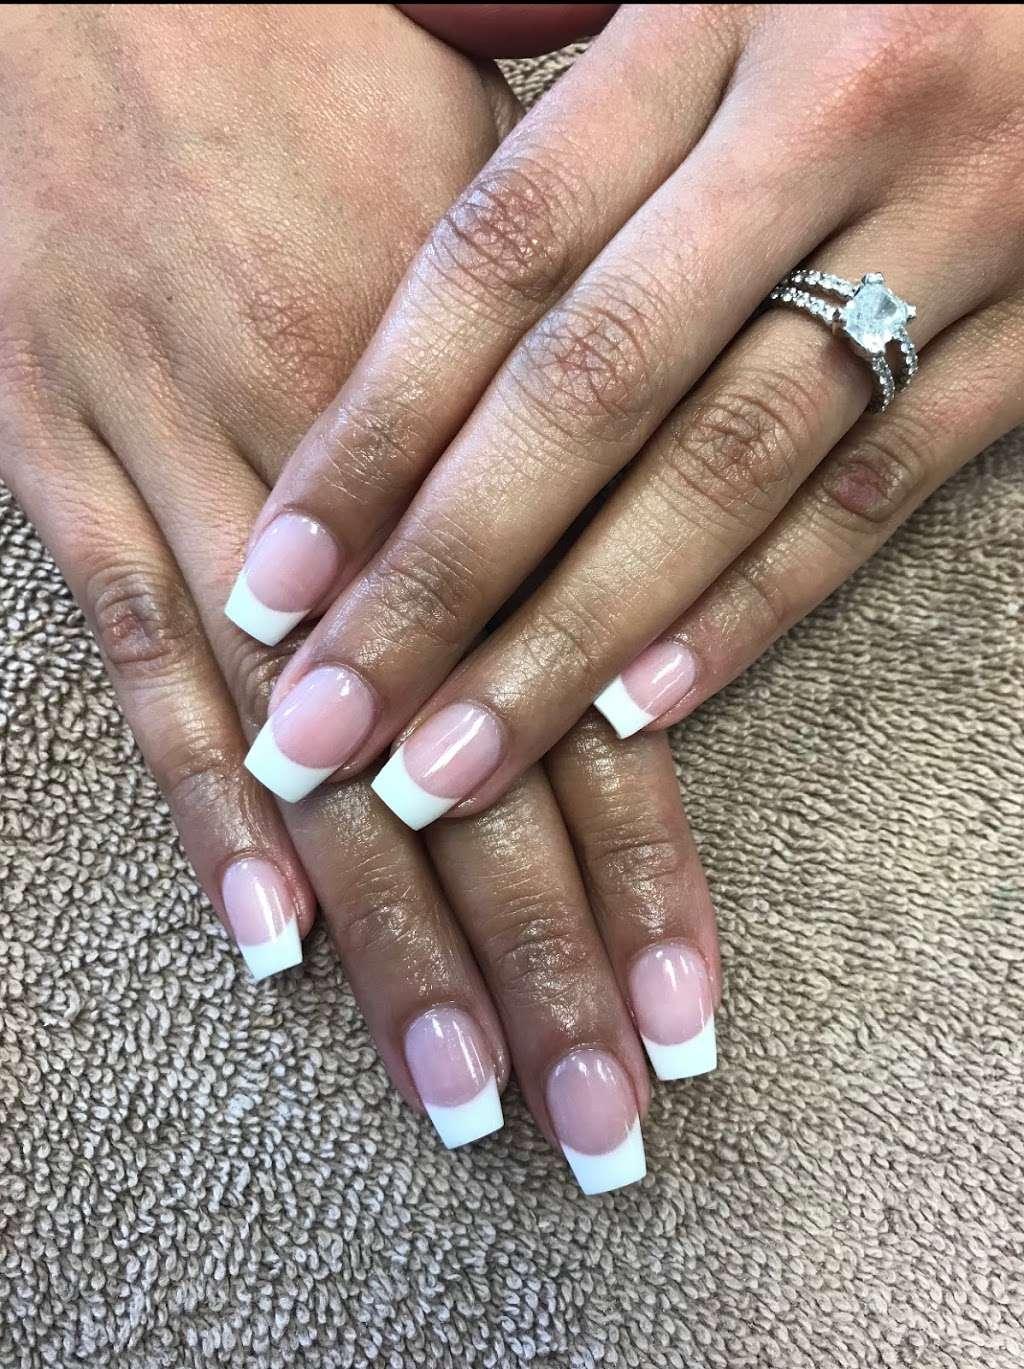 Diamond Nails Miramar - hair care    Photo 2 of 10   Address: 17071 Miramar Pkwy, Miramar, FL 33027, USA   Phone: (954) 318-1912